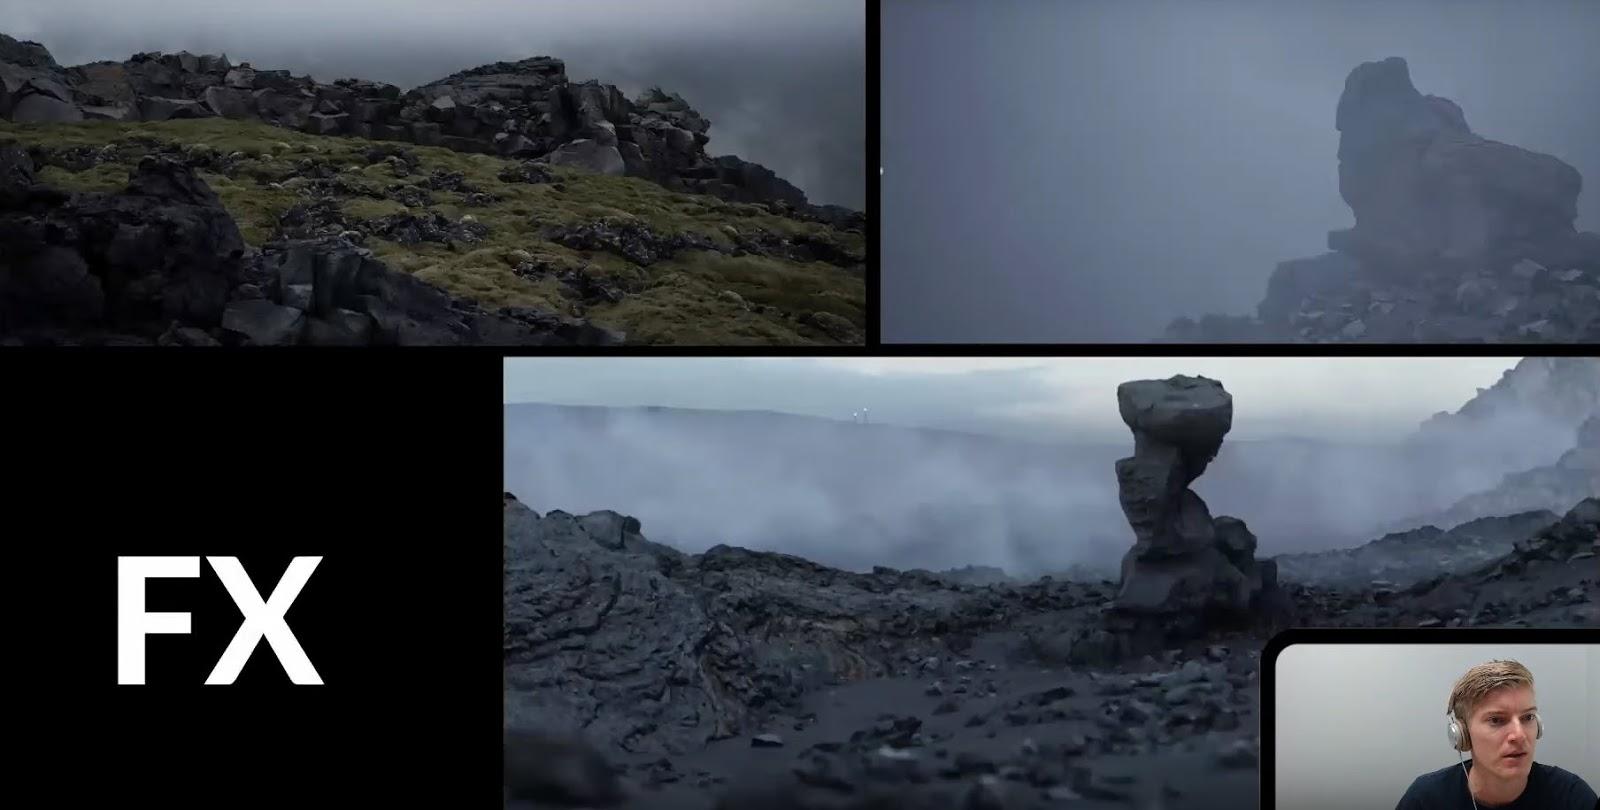 Rebirth: Worldbuilding with Unreal Engine and Houdini